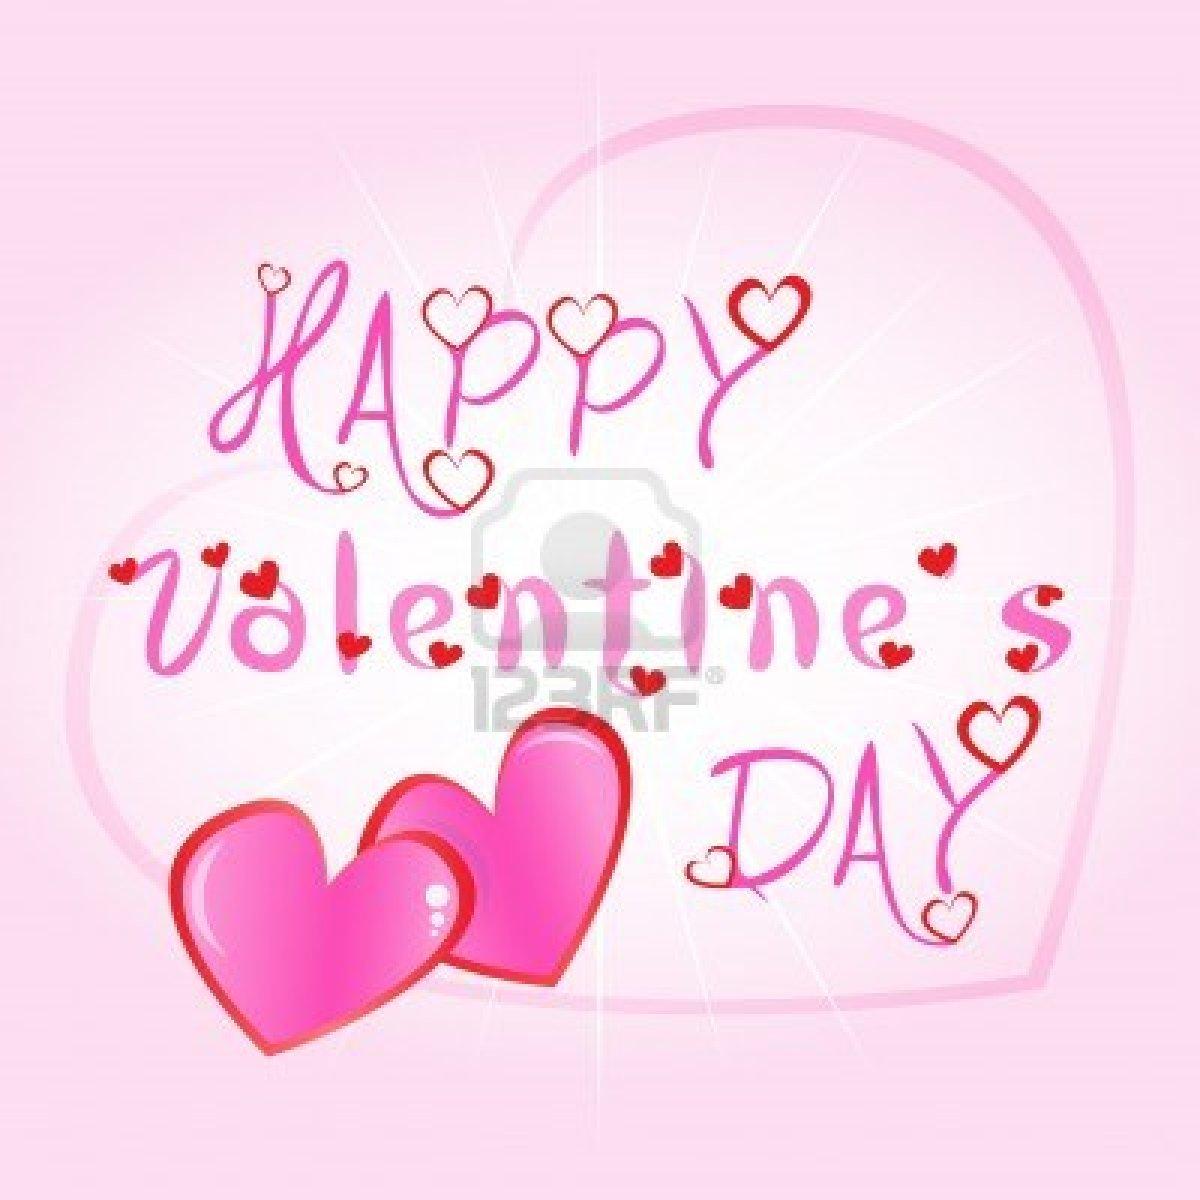 Valentines day cards gerhard leixl valentines day cards m4hsunfo